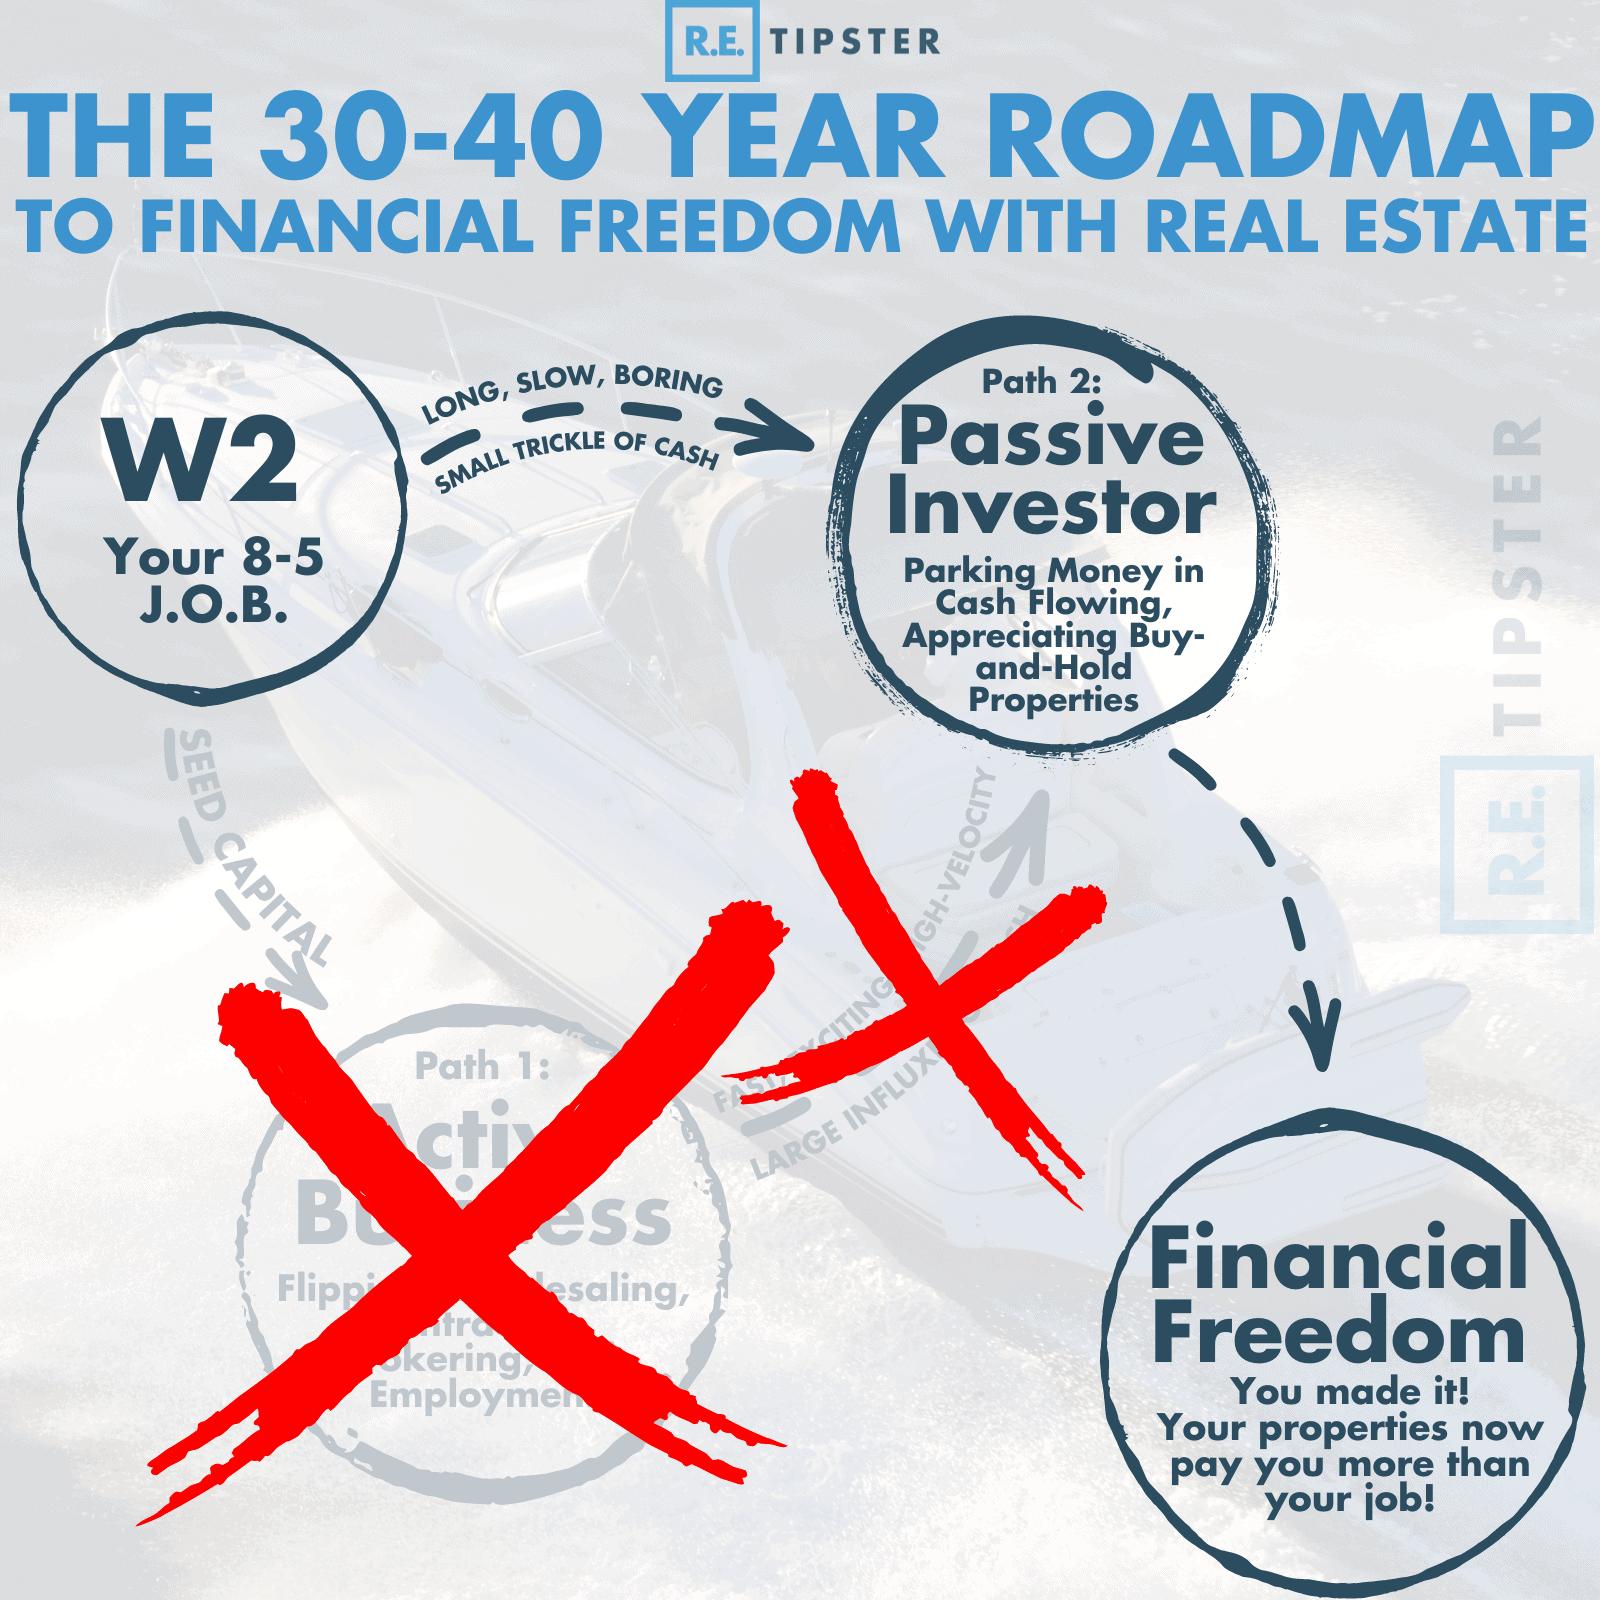 30-40 year roadmap